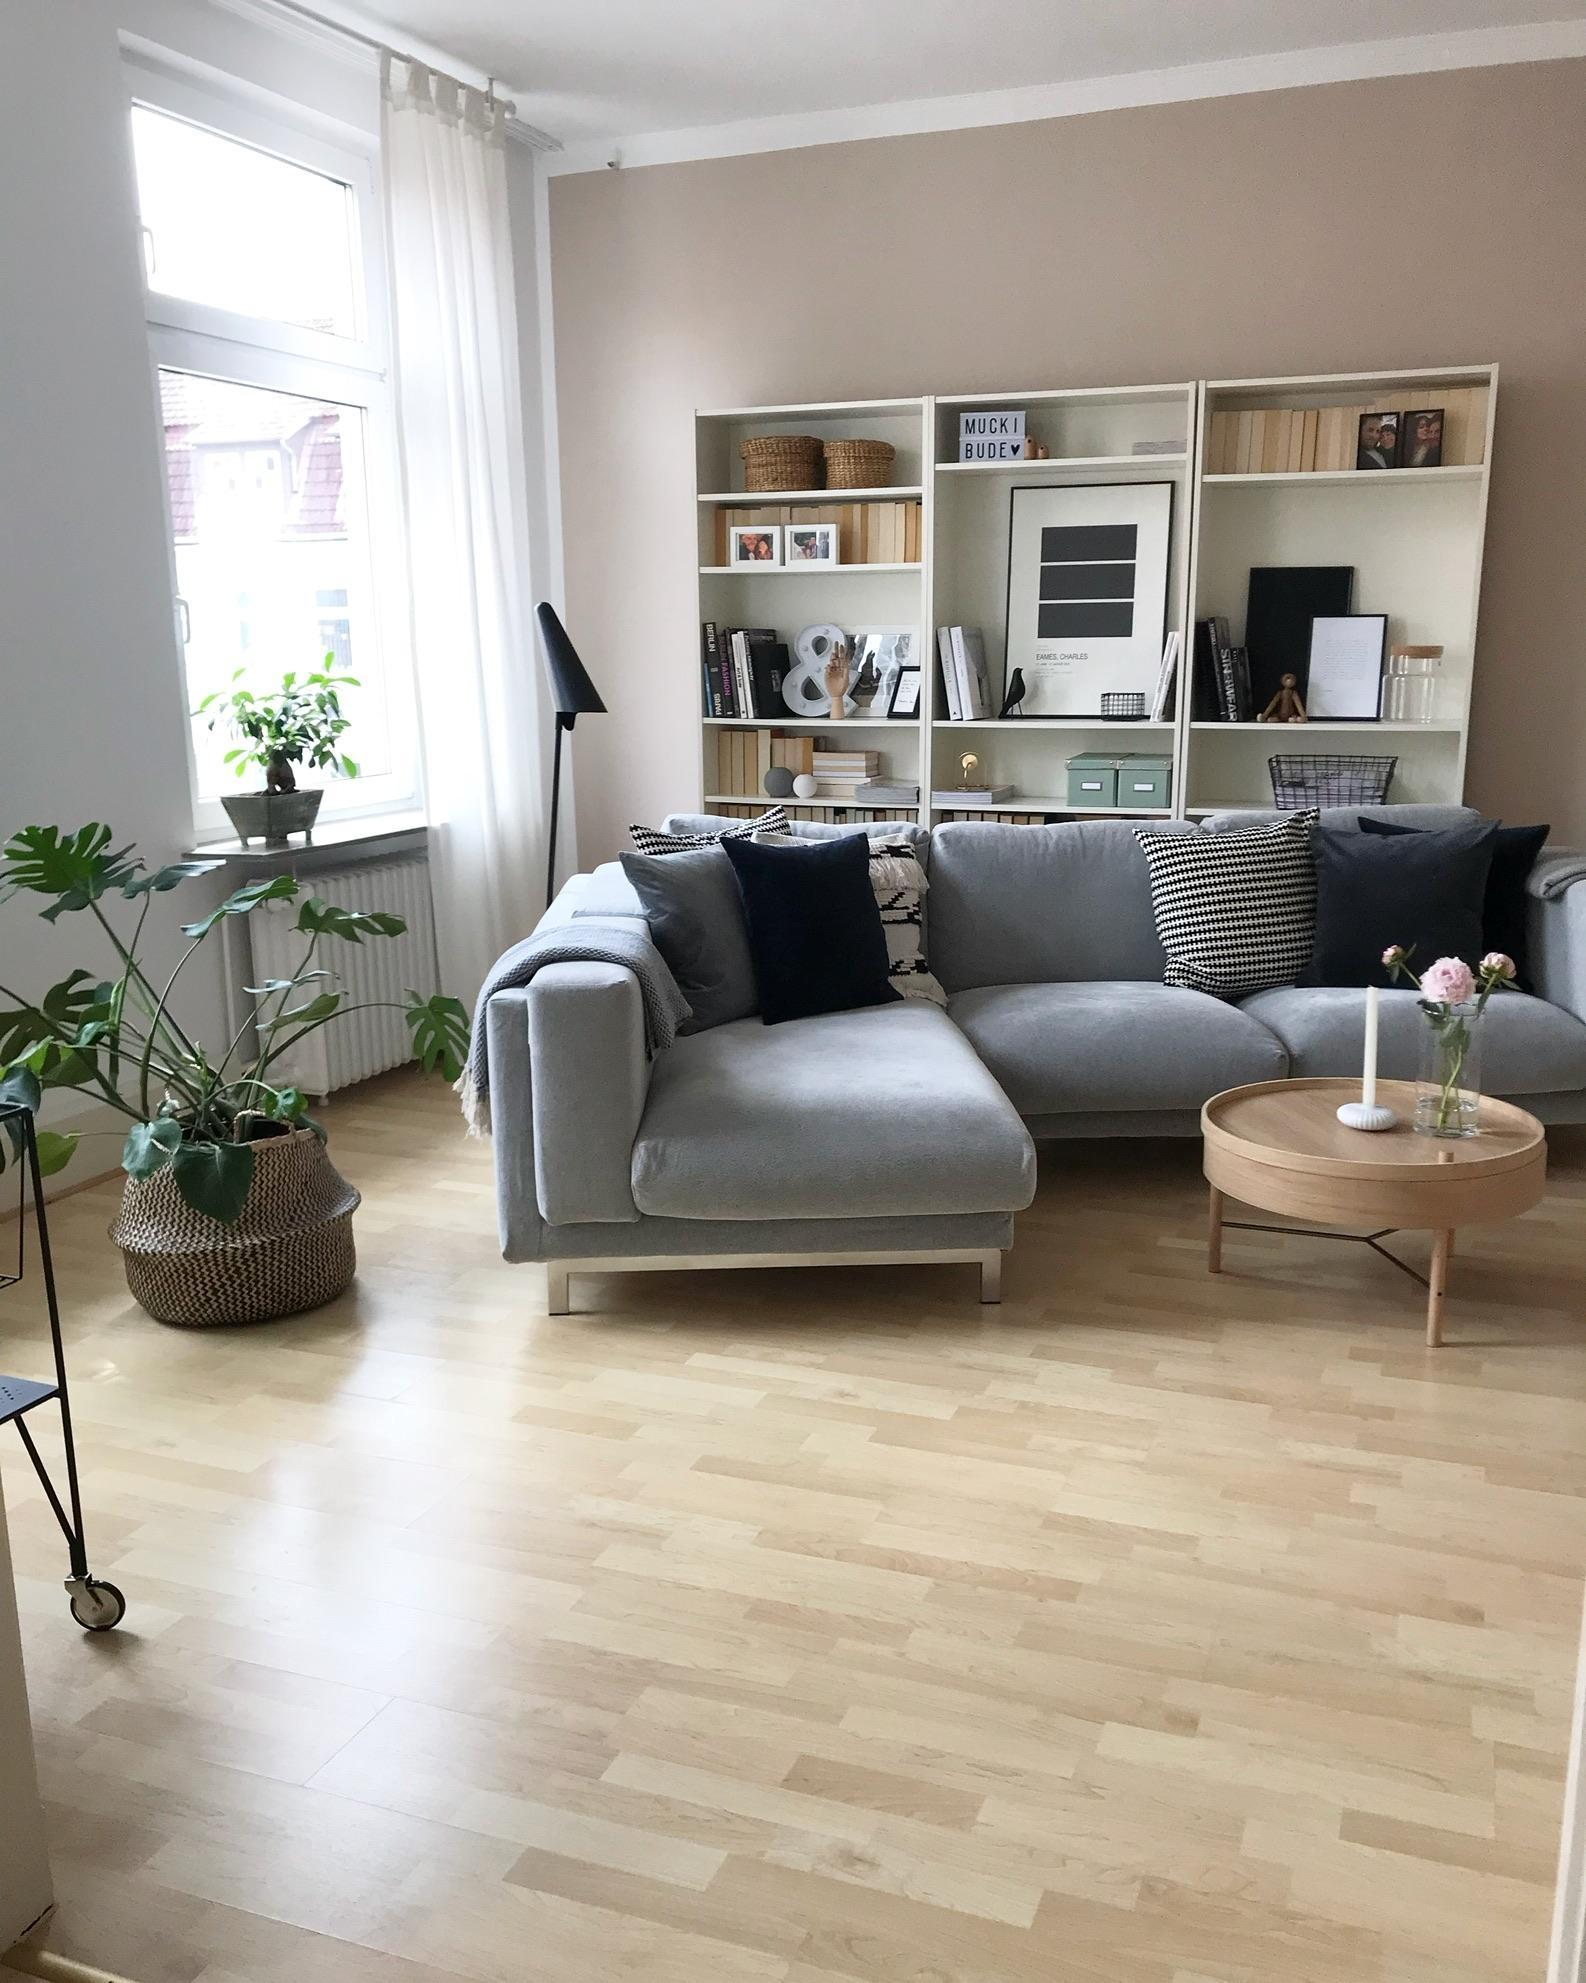 Chill Ecke die mucki-chill ecke 🐰🐰 #livingroom #diemucki_bude •